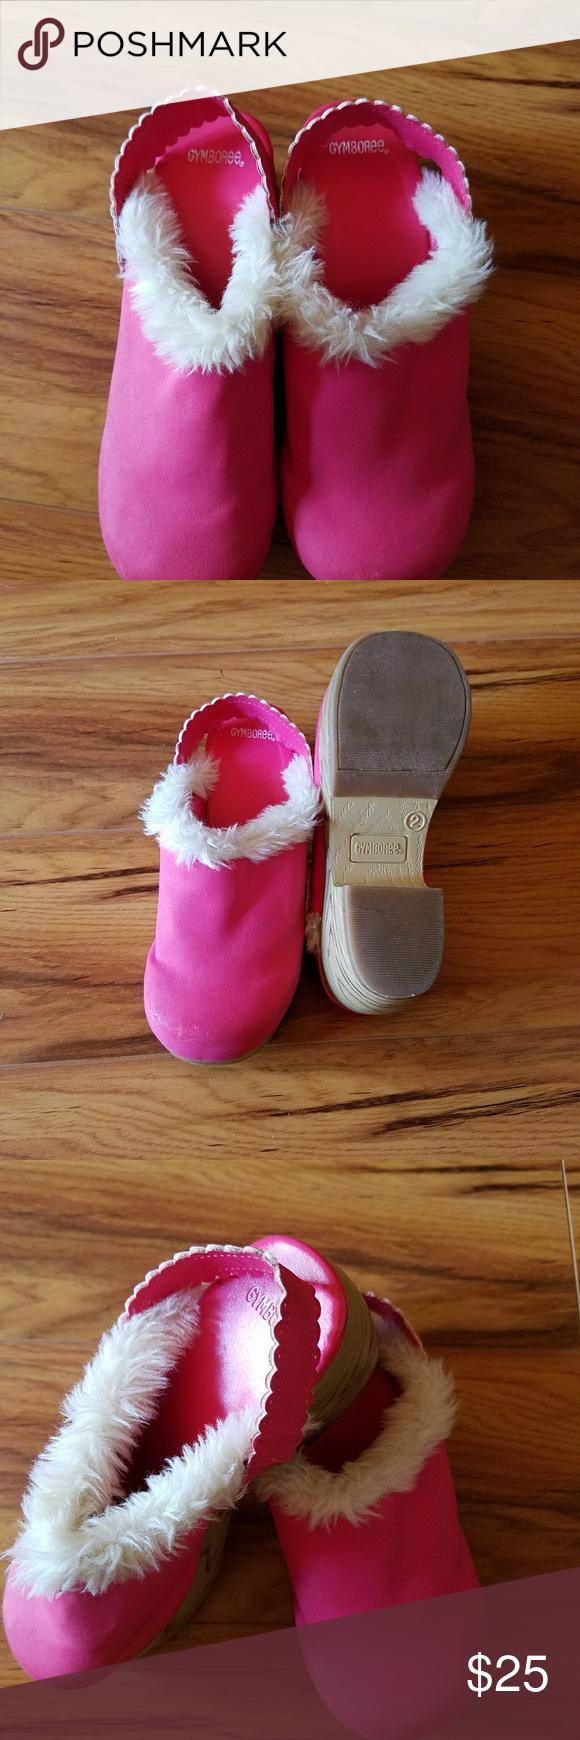 Pink dress shoes for ladies  Girls Pink Gymboree Clog Shoes Size   My Posh Picks  Pinterest